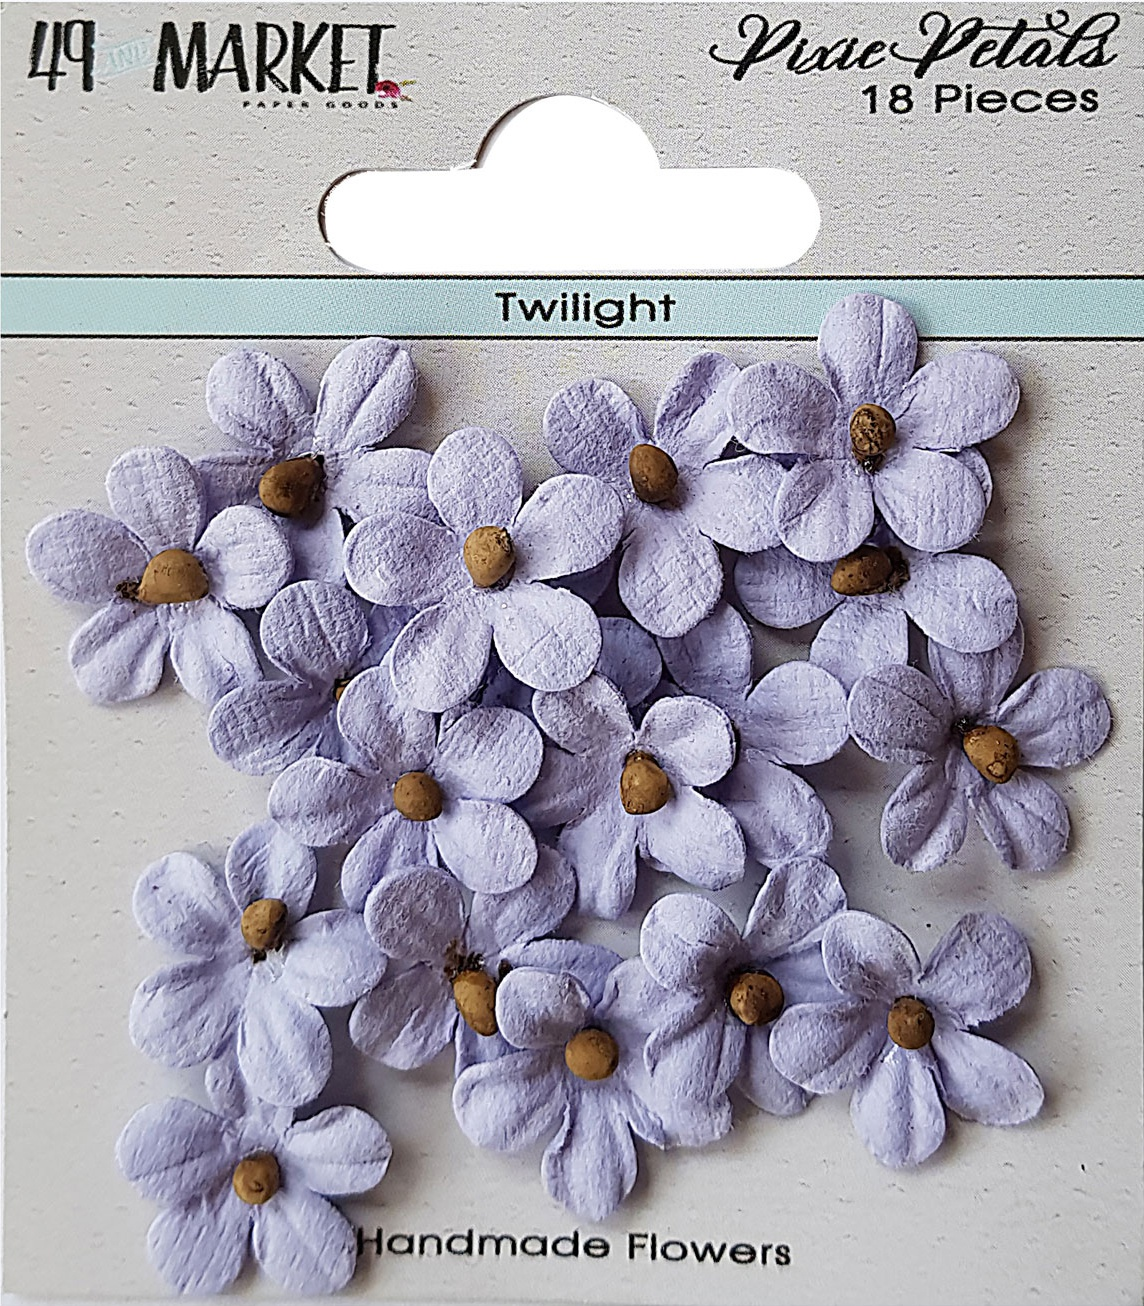 49 And Market Pixie Petals 18/Pkg-Twilight